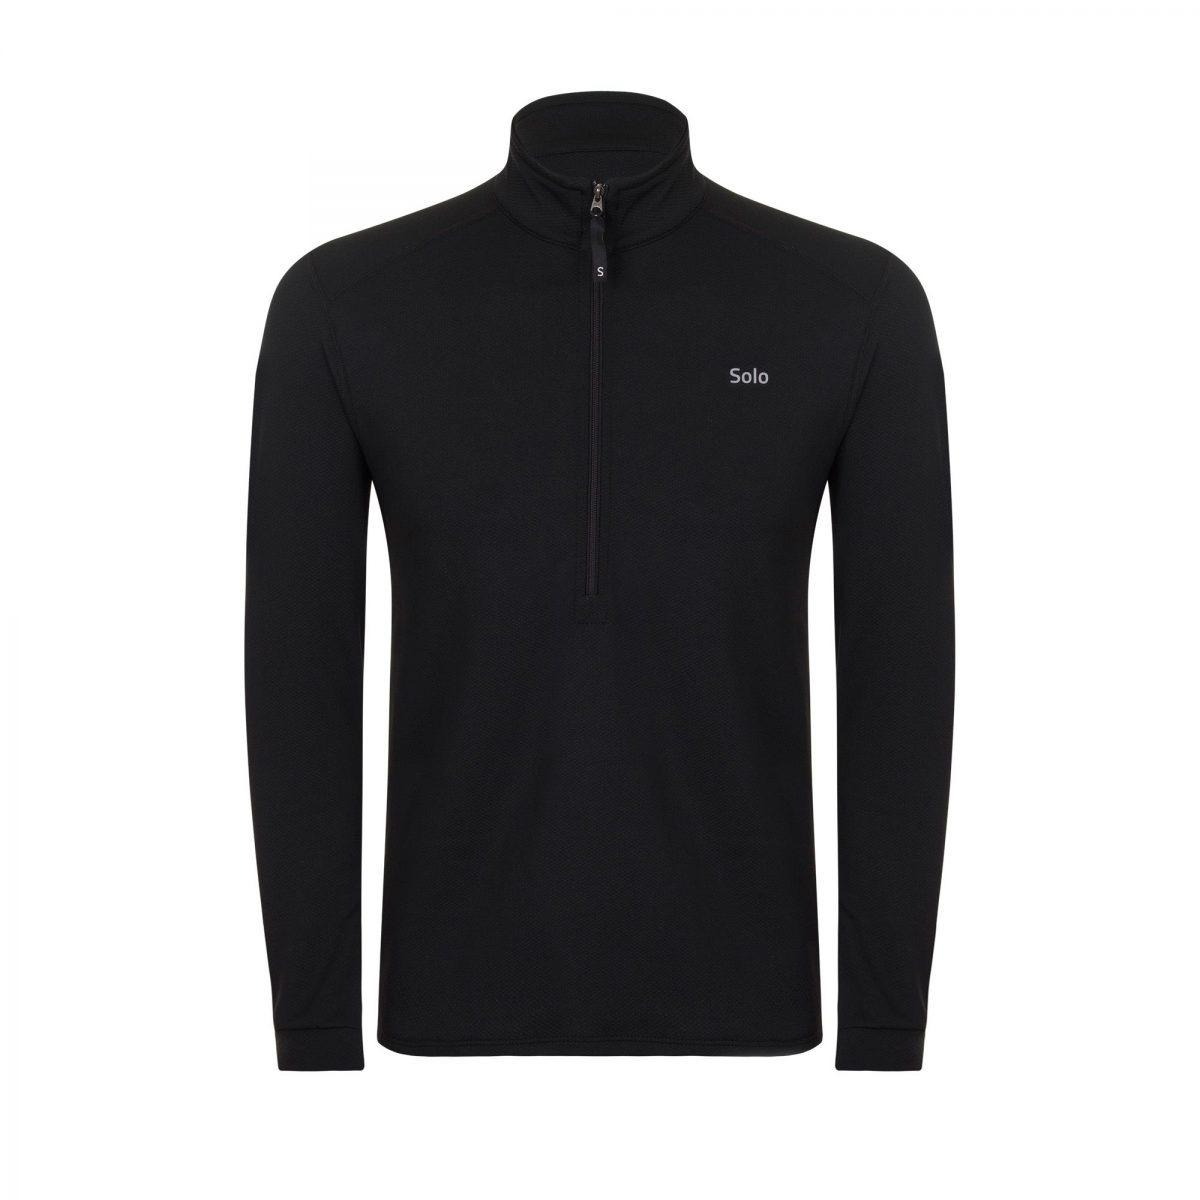 232edac79 blusa solo x-thermo ds zip t-shirt (térmica) masculina. Carregando zoom.